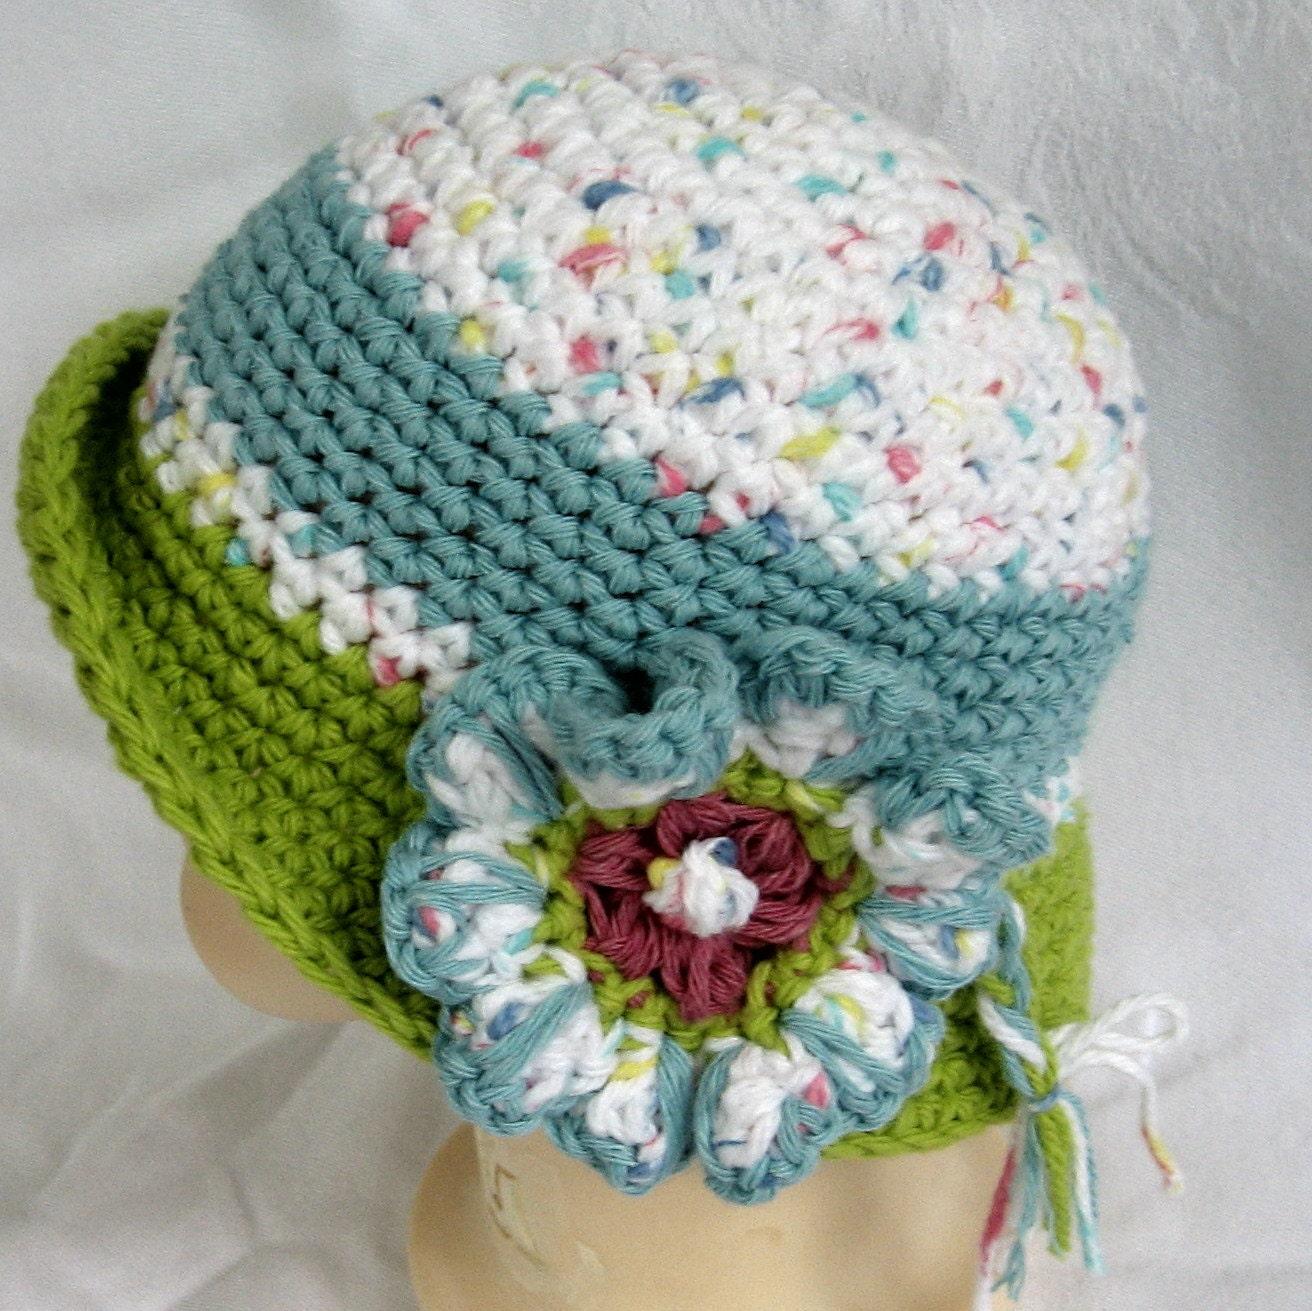 Crochet Brim Toddler Hat Pattern : Baby Girls Crochet Hat Pattern Brimmed With by kalliedesigns